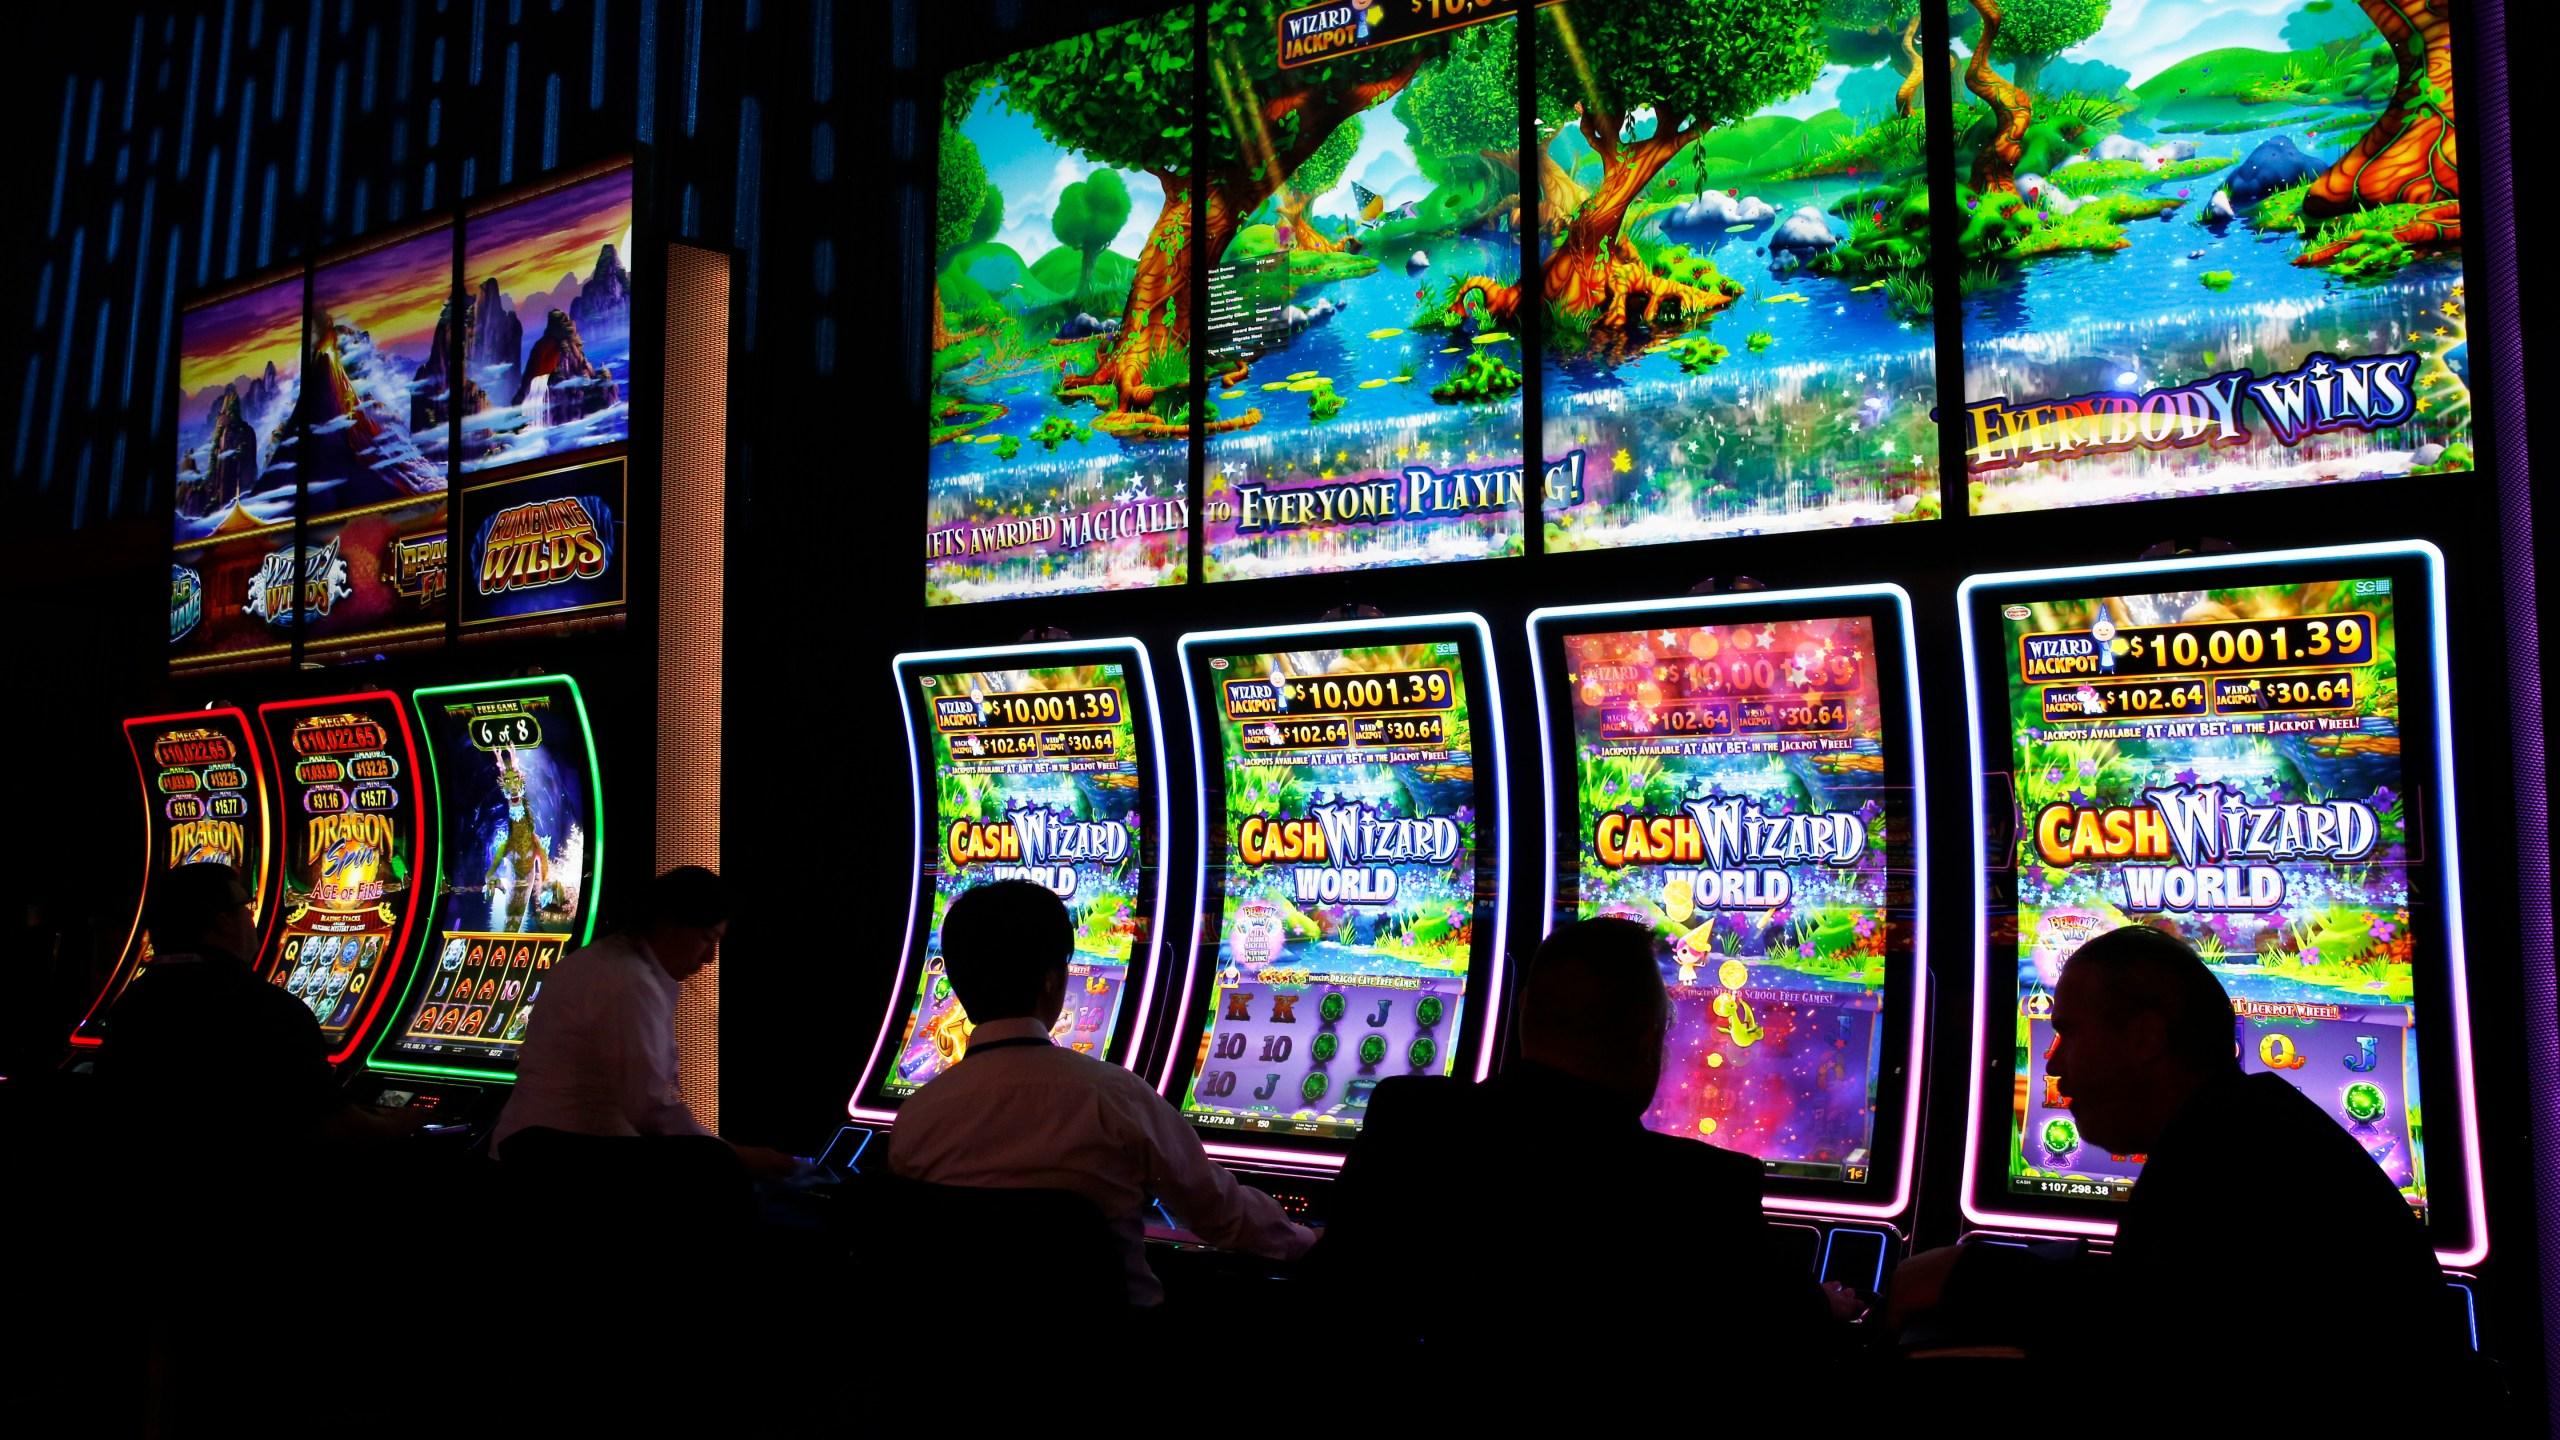 Sports_Gambling_Trade_Show_58091-159532.jpg23010460